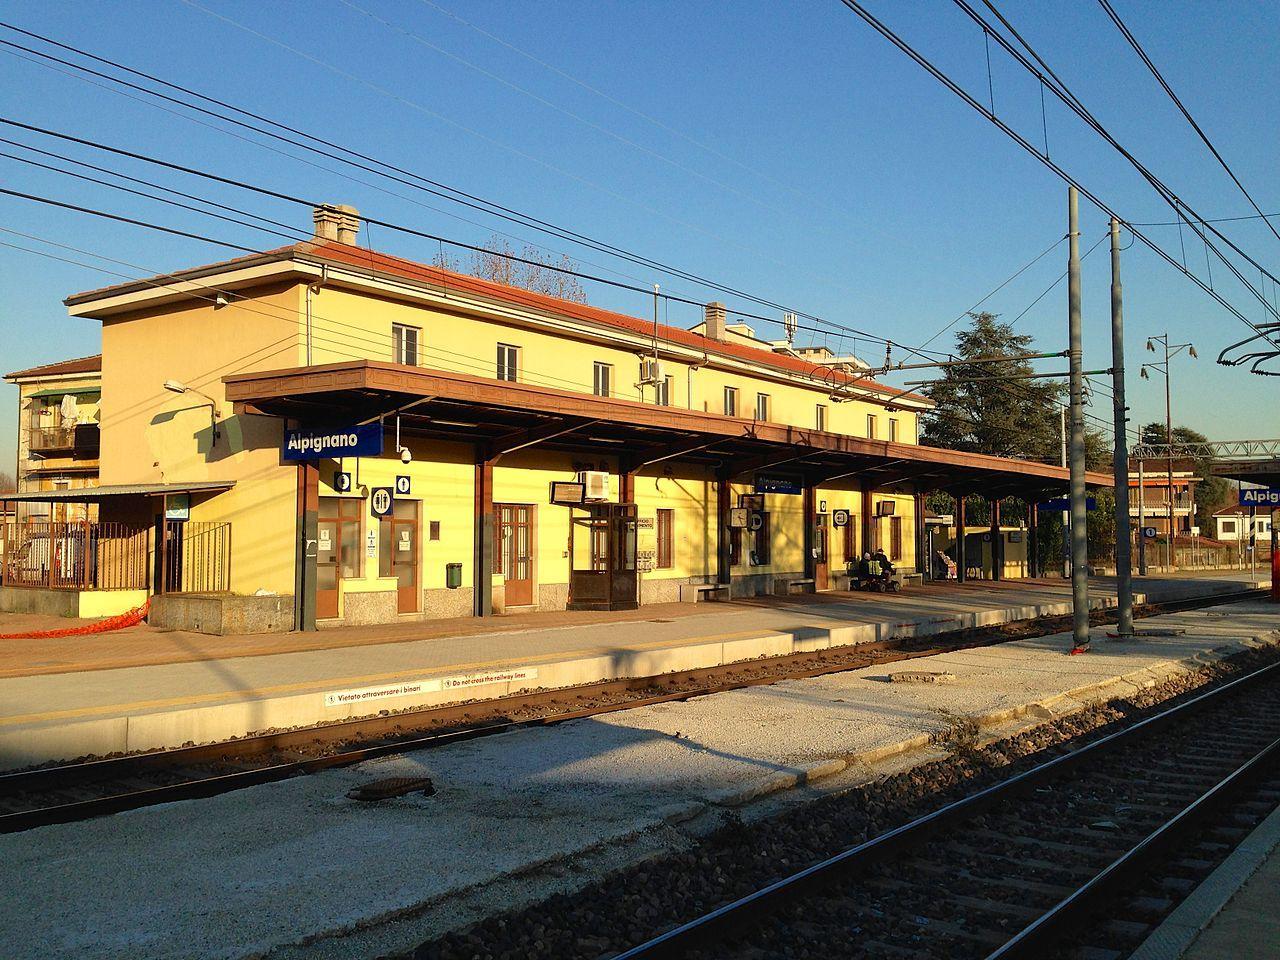 Stazione di Alpignano 01.jpg